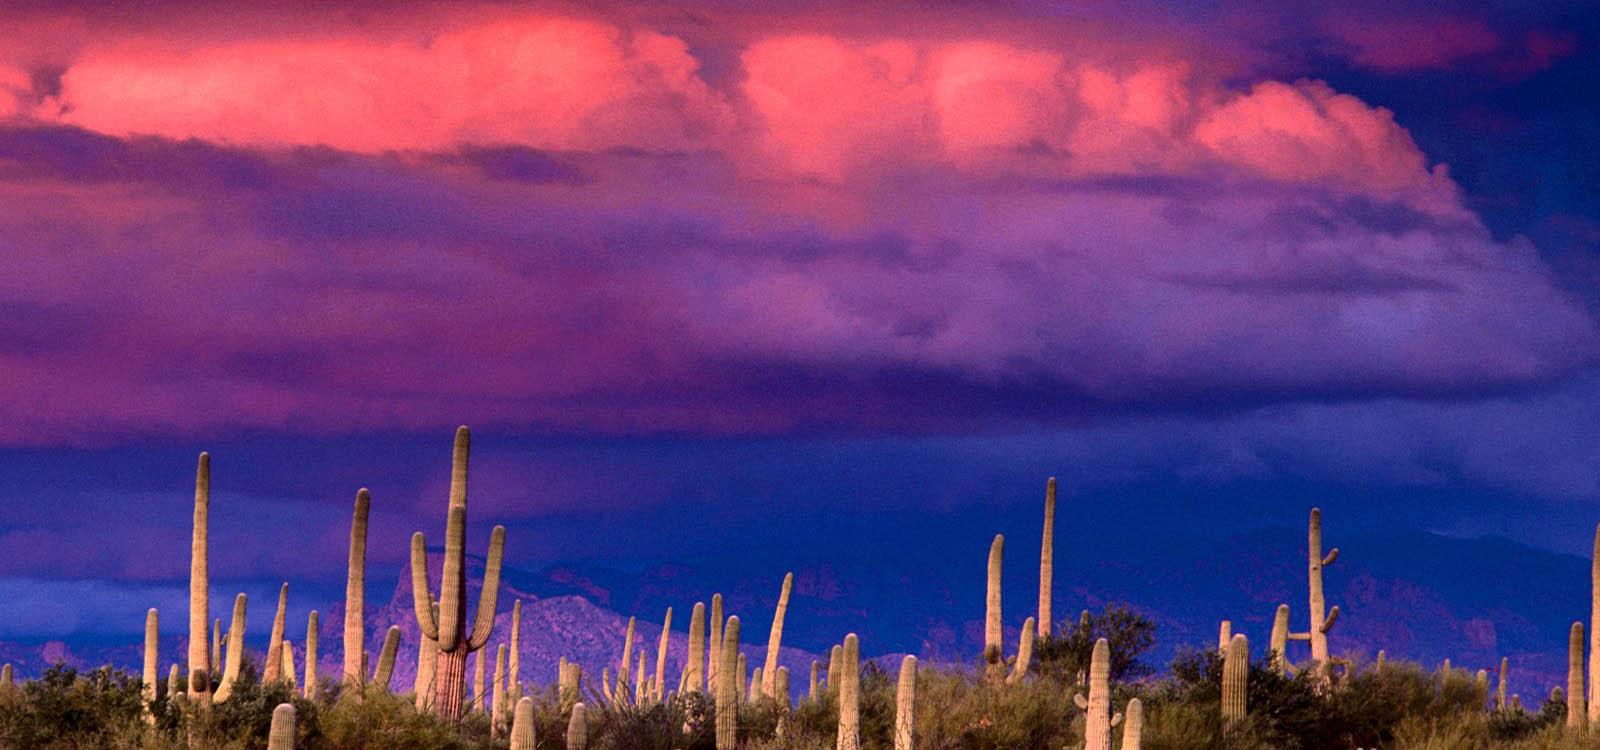 sonoran desert storm